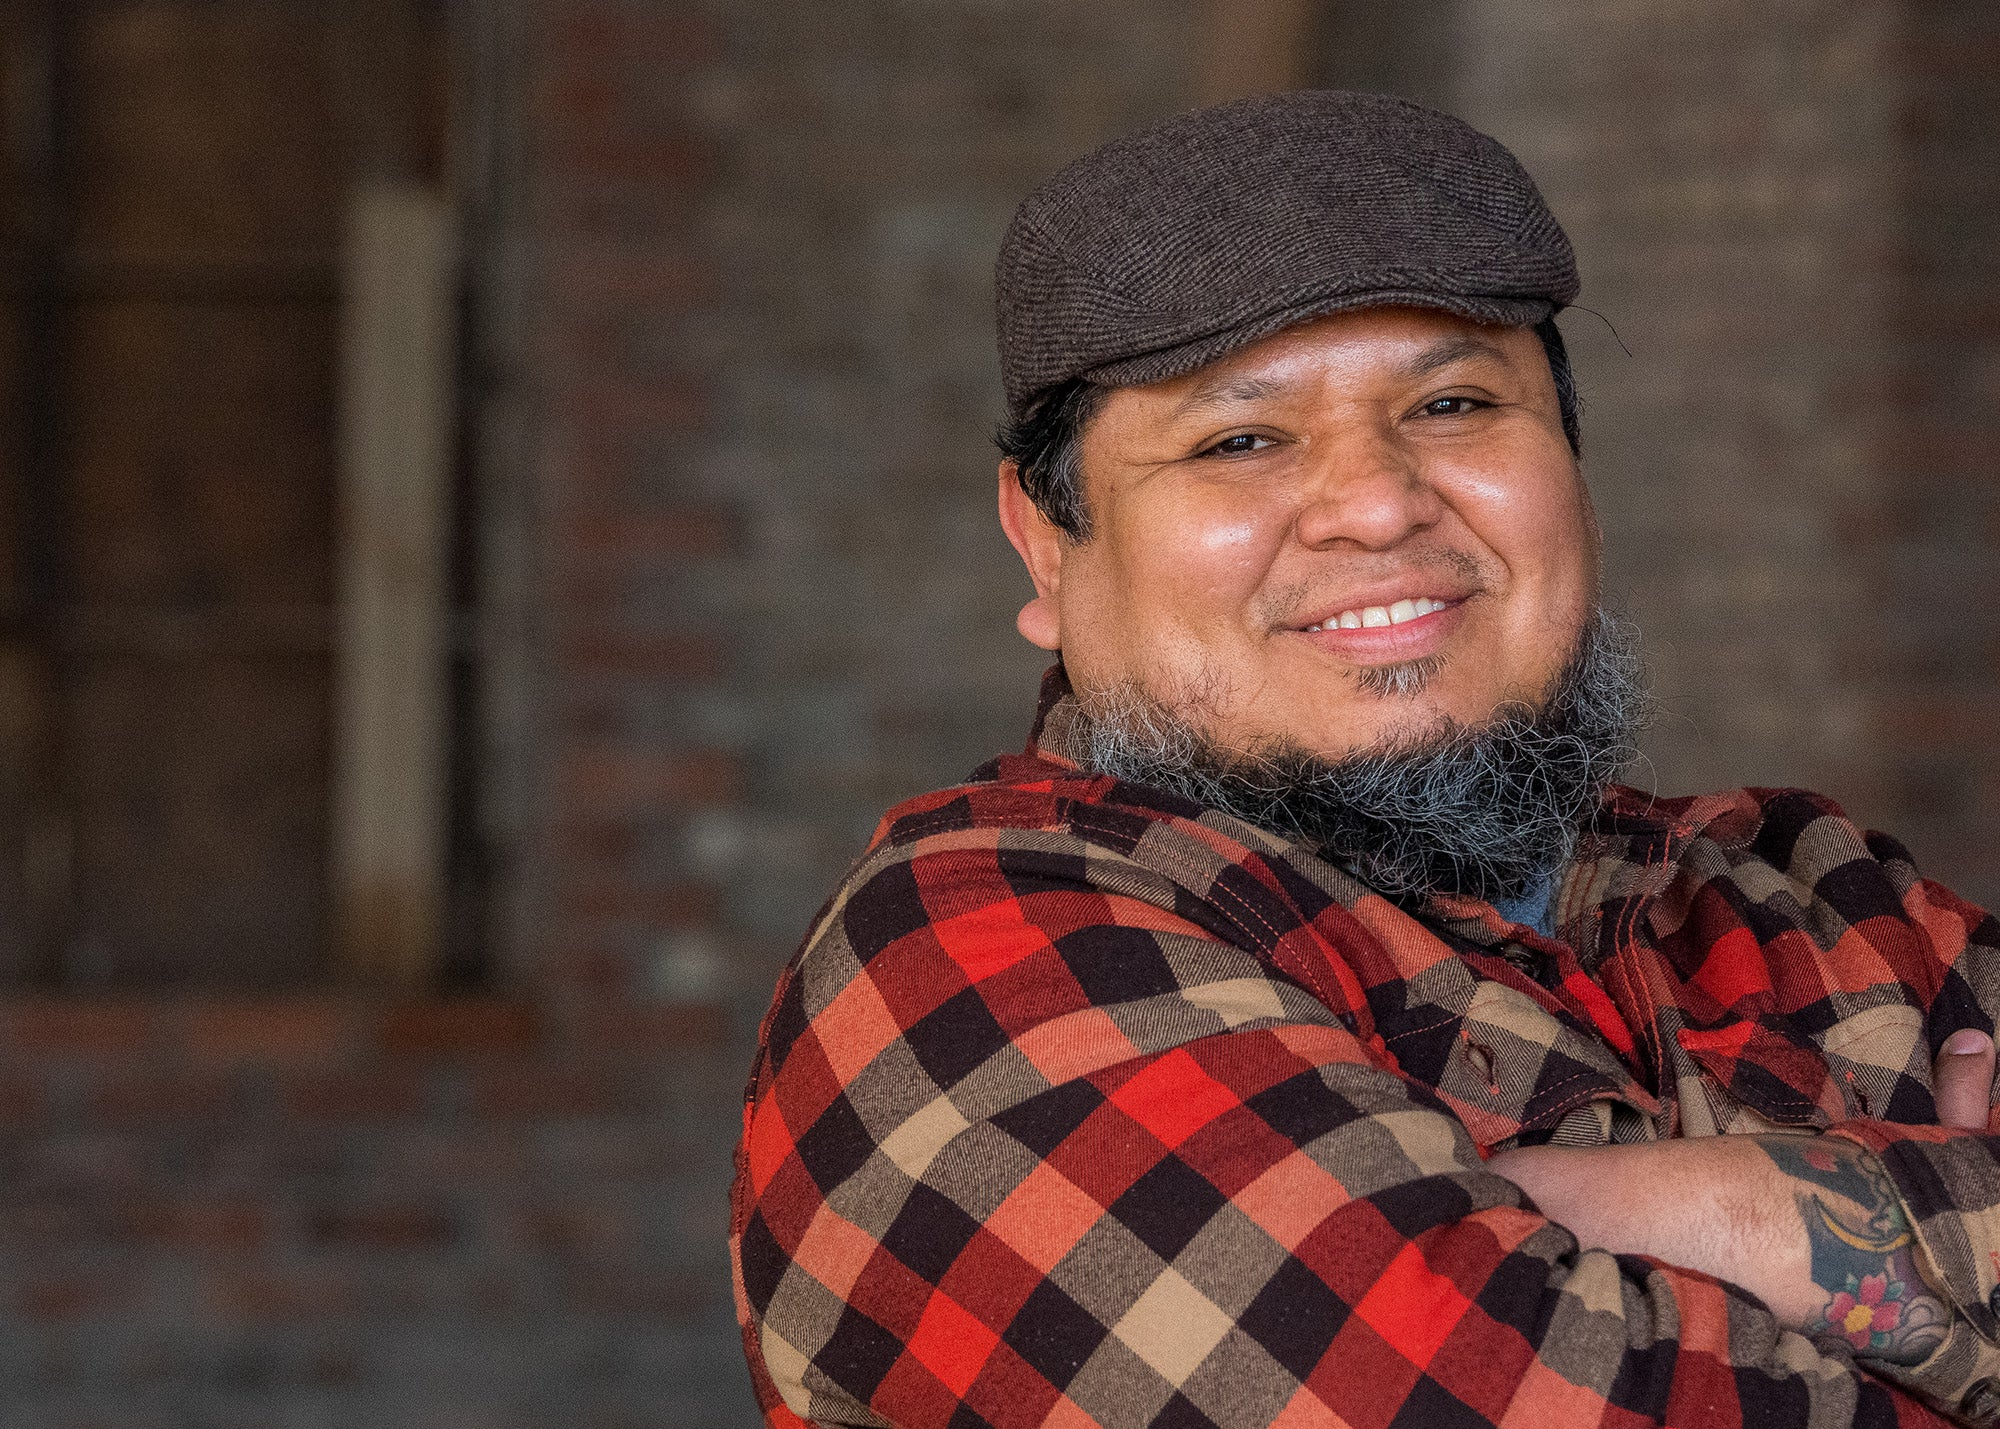 Luis Espinoza, head brewer at Roundhead Brewing Co.